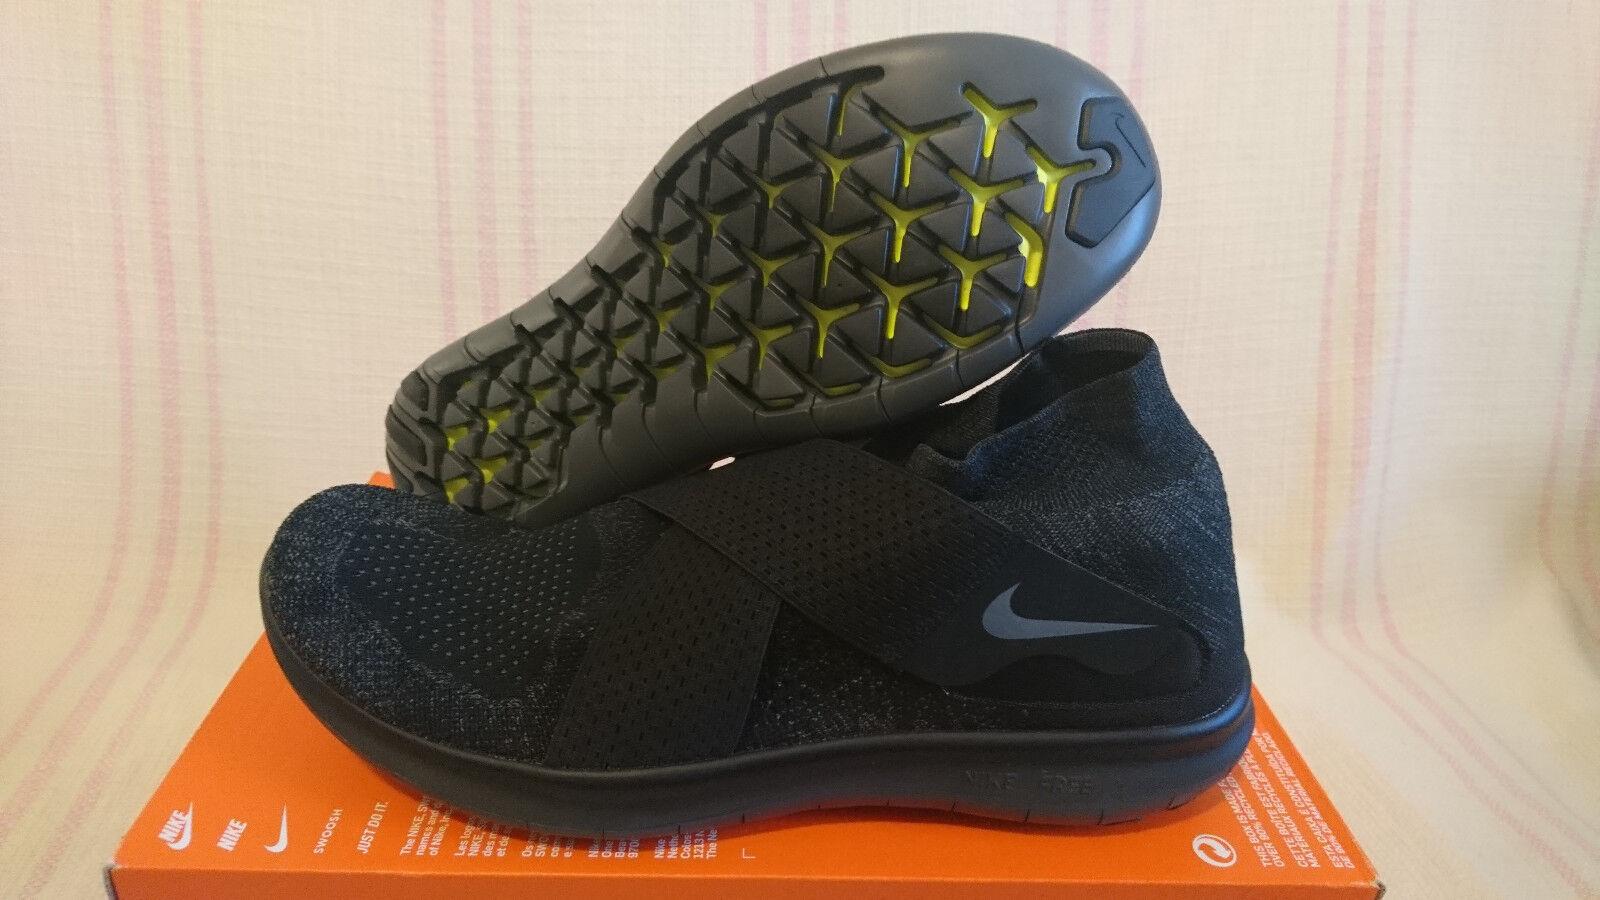 Sz 14 Nike Free RN Motion Flyknit 2018 Running Black Grey Anthracite 880845 003